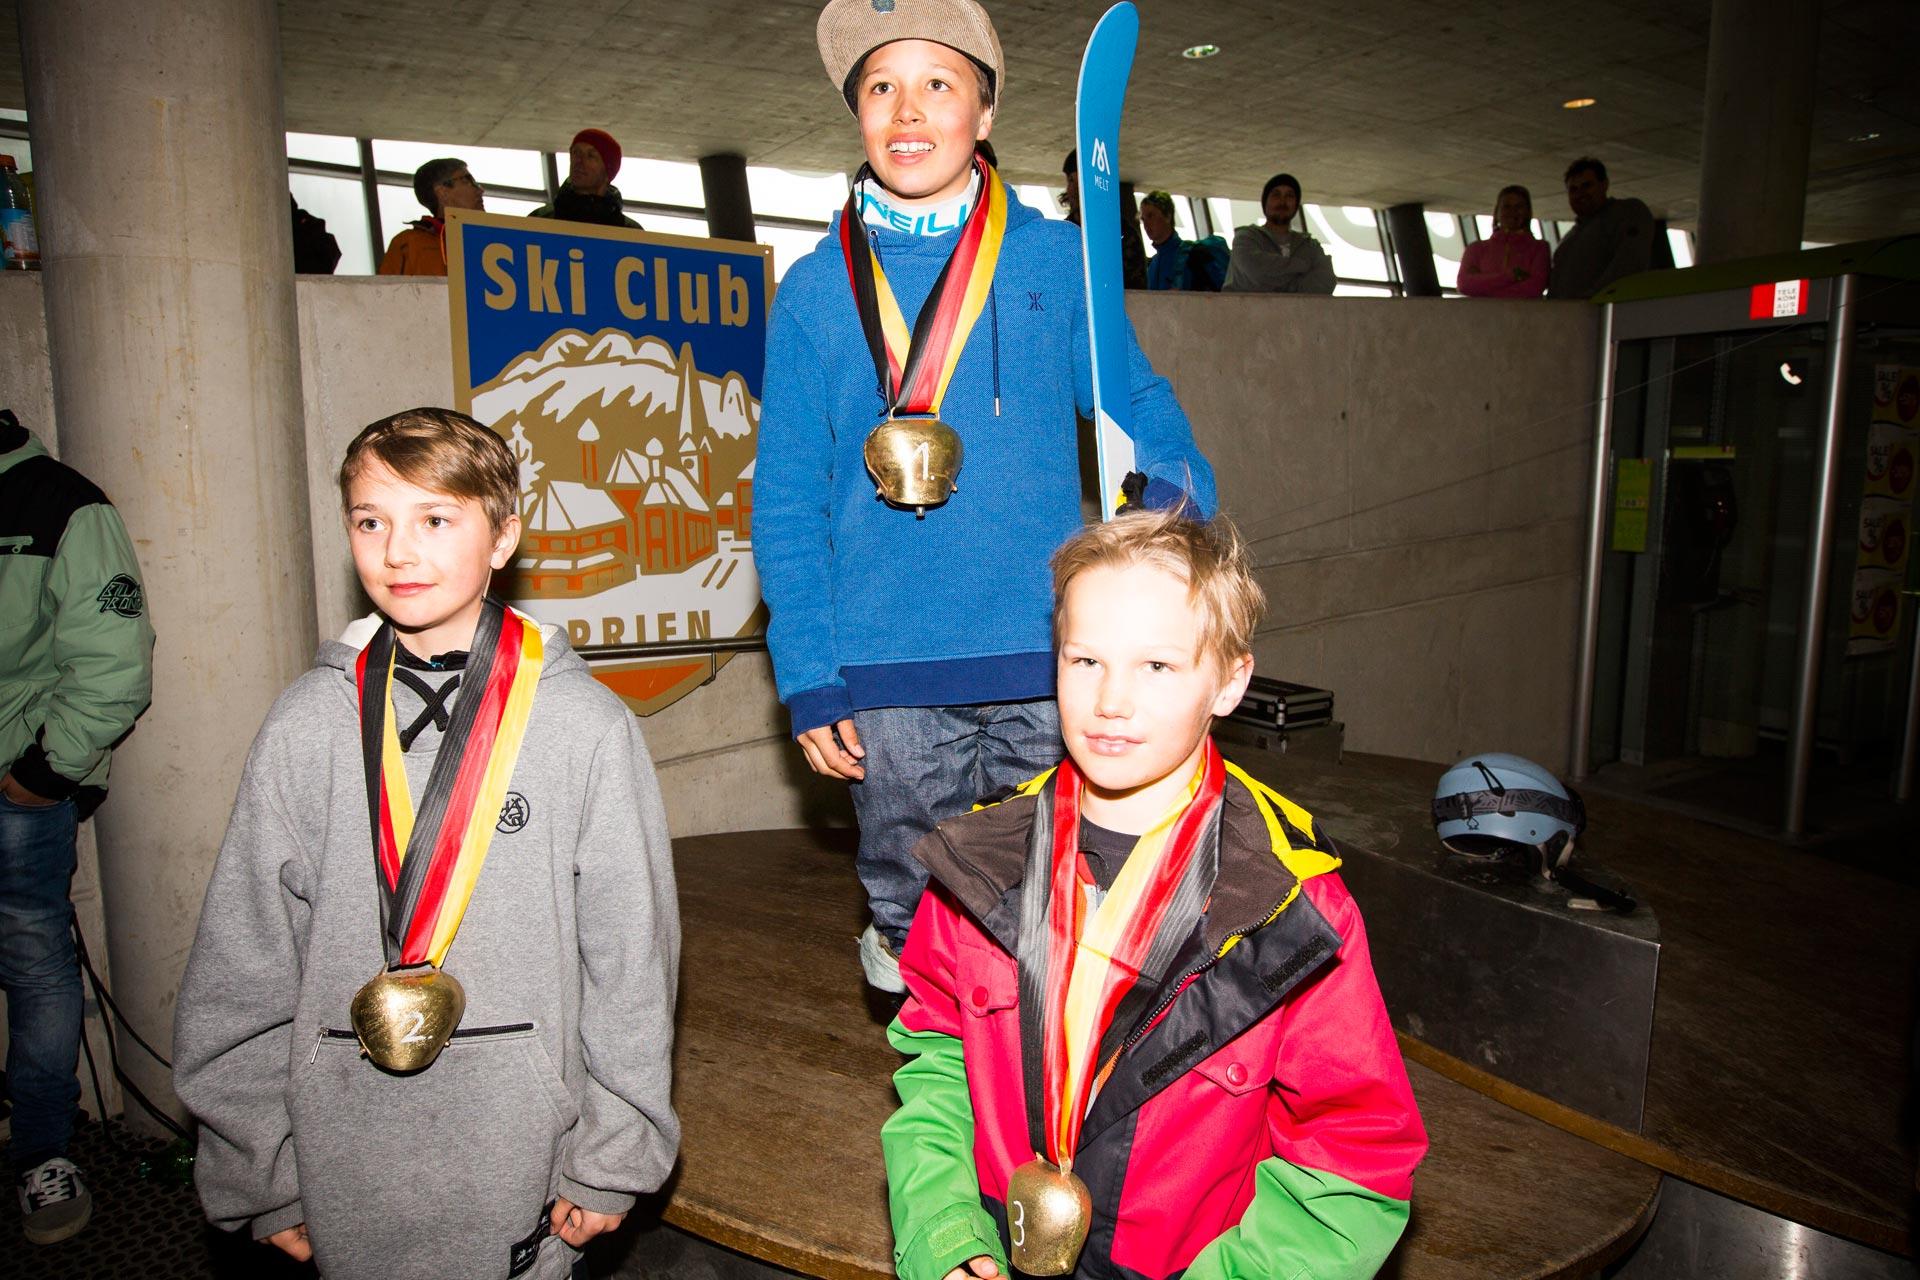 Podium der Boys, Jahrgang 04 - 05: Philipp Mayer, Nico Hauzenberger, Tom Buchholz - Foto: Florian Breitenberger